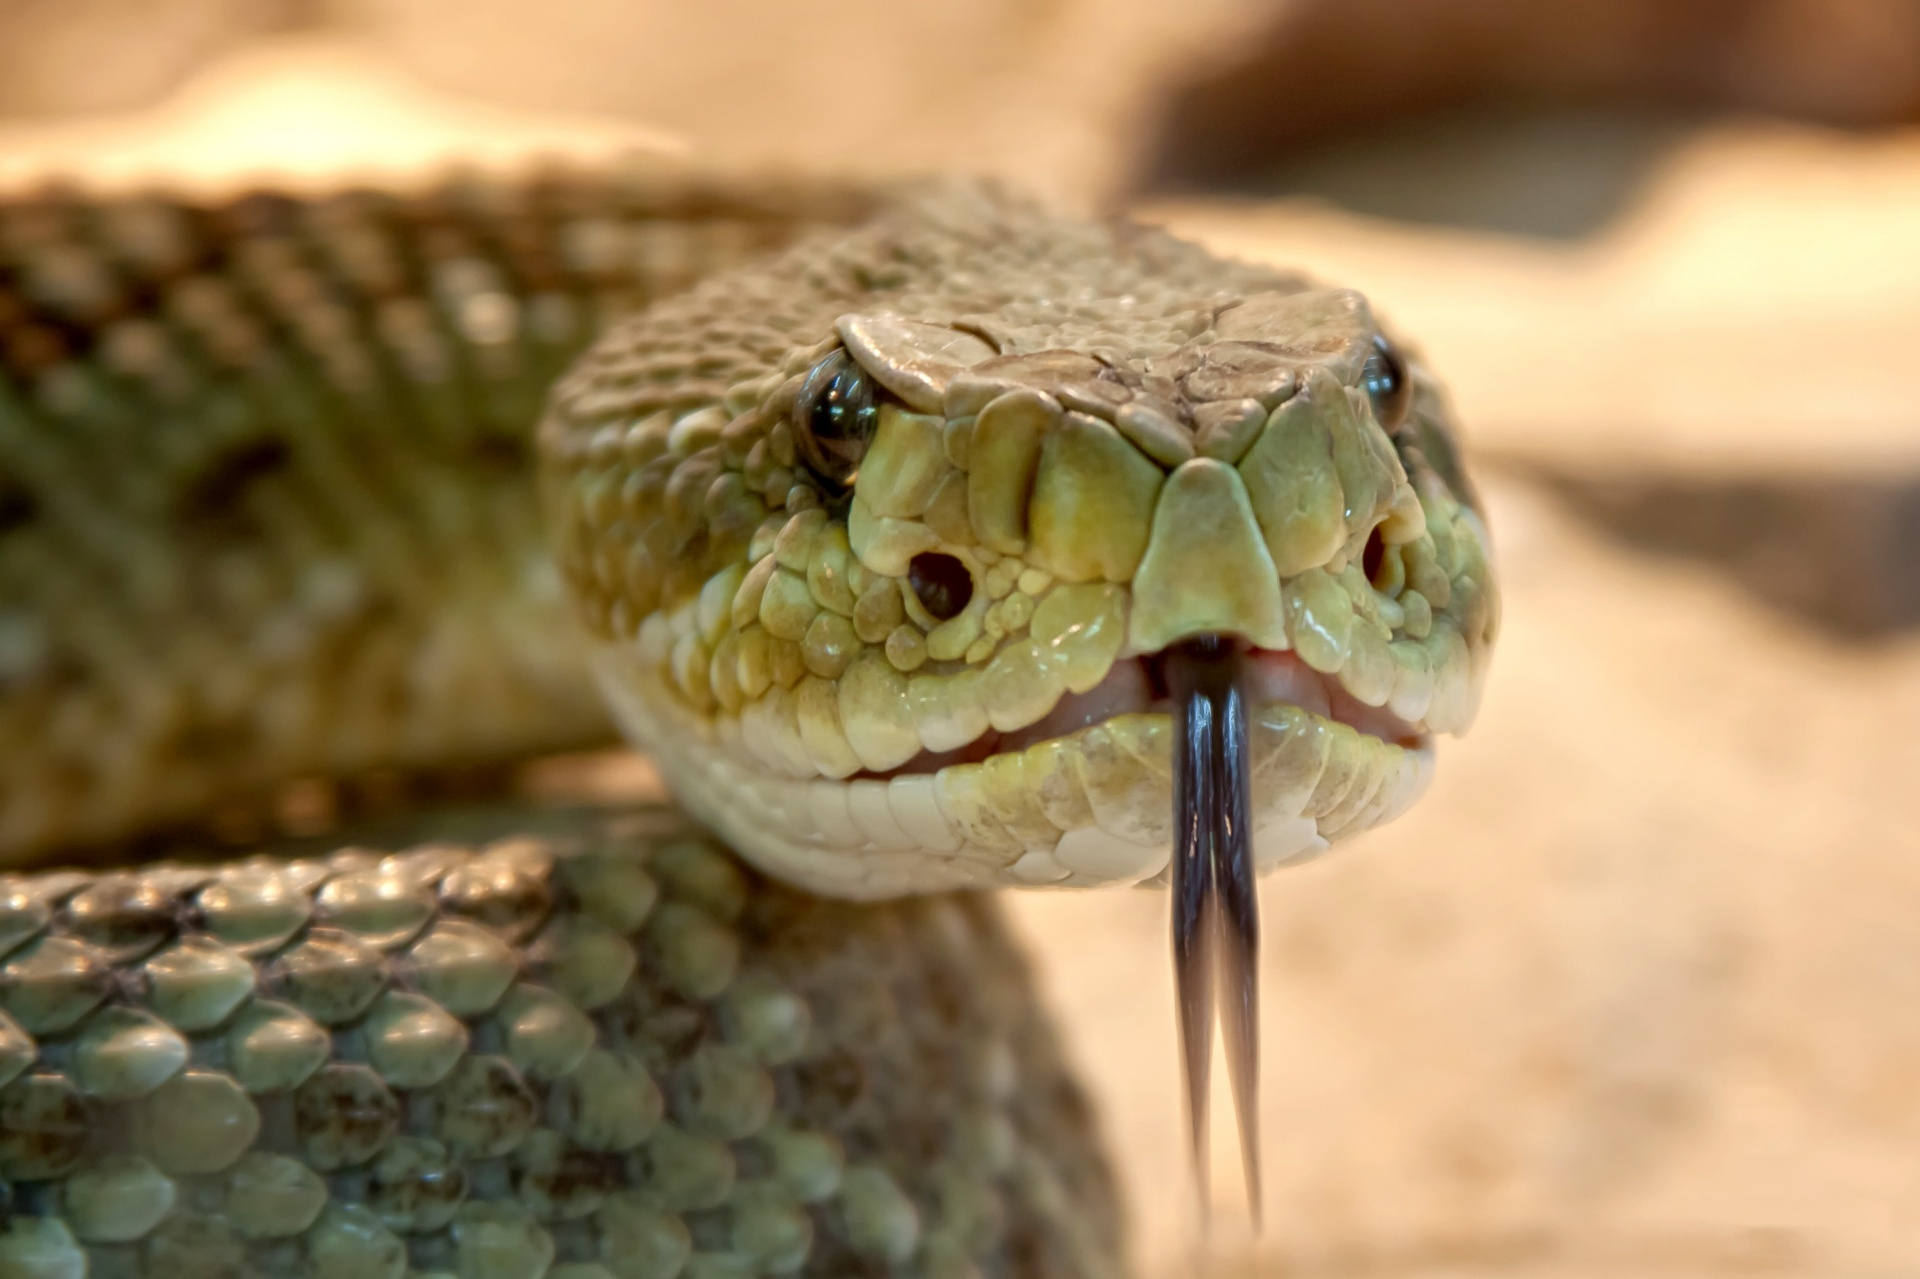 Close up of a rattlesnake